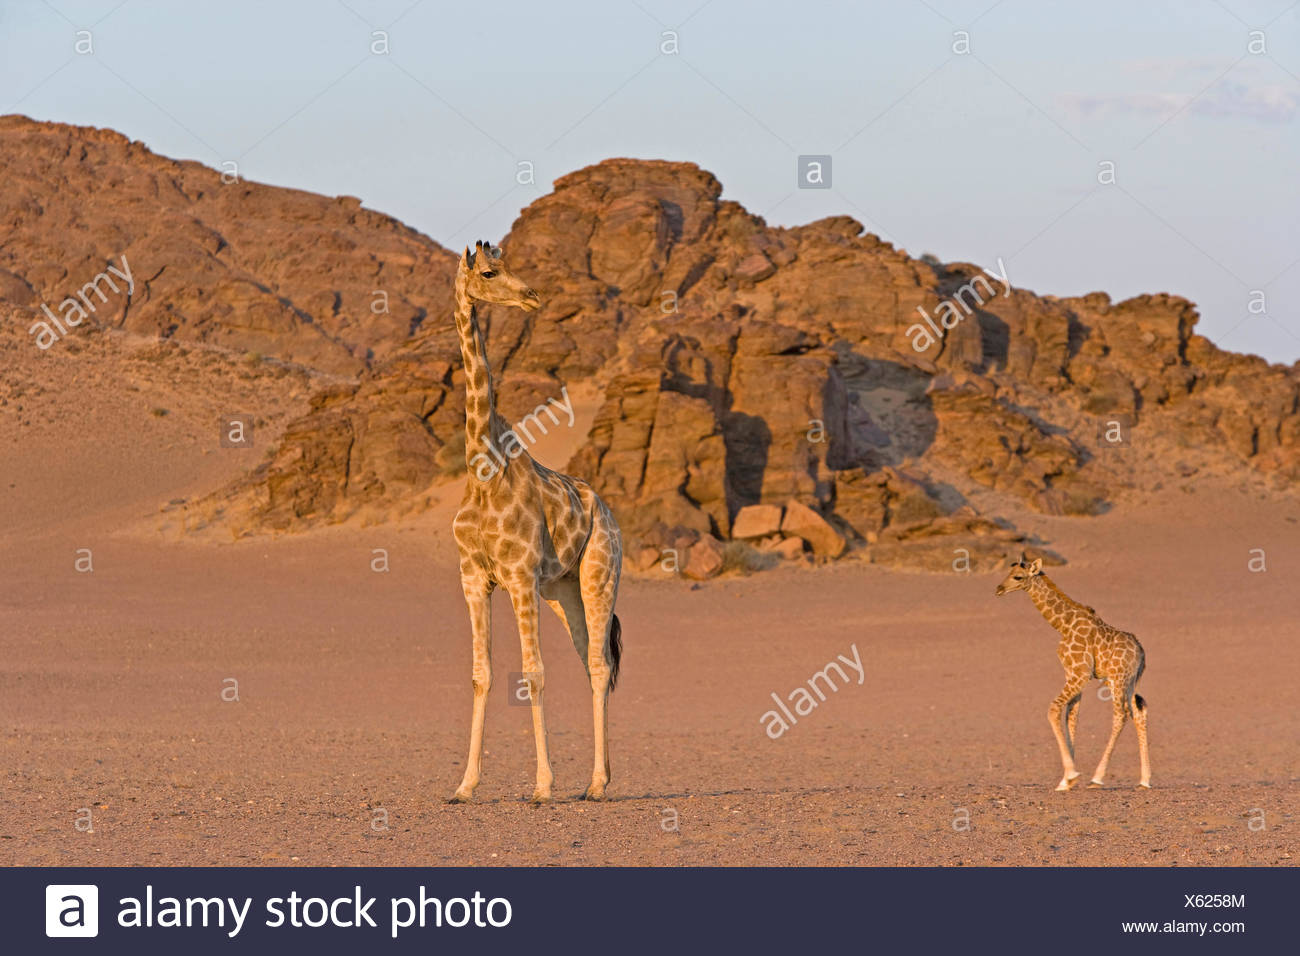 Angolan Giraffe, Namibian Giraffe (Giraffa camelopardalis angolensis) Female young standing the Namib desert Namib-Skeleton Coas - Stock Image